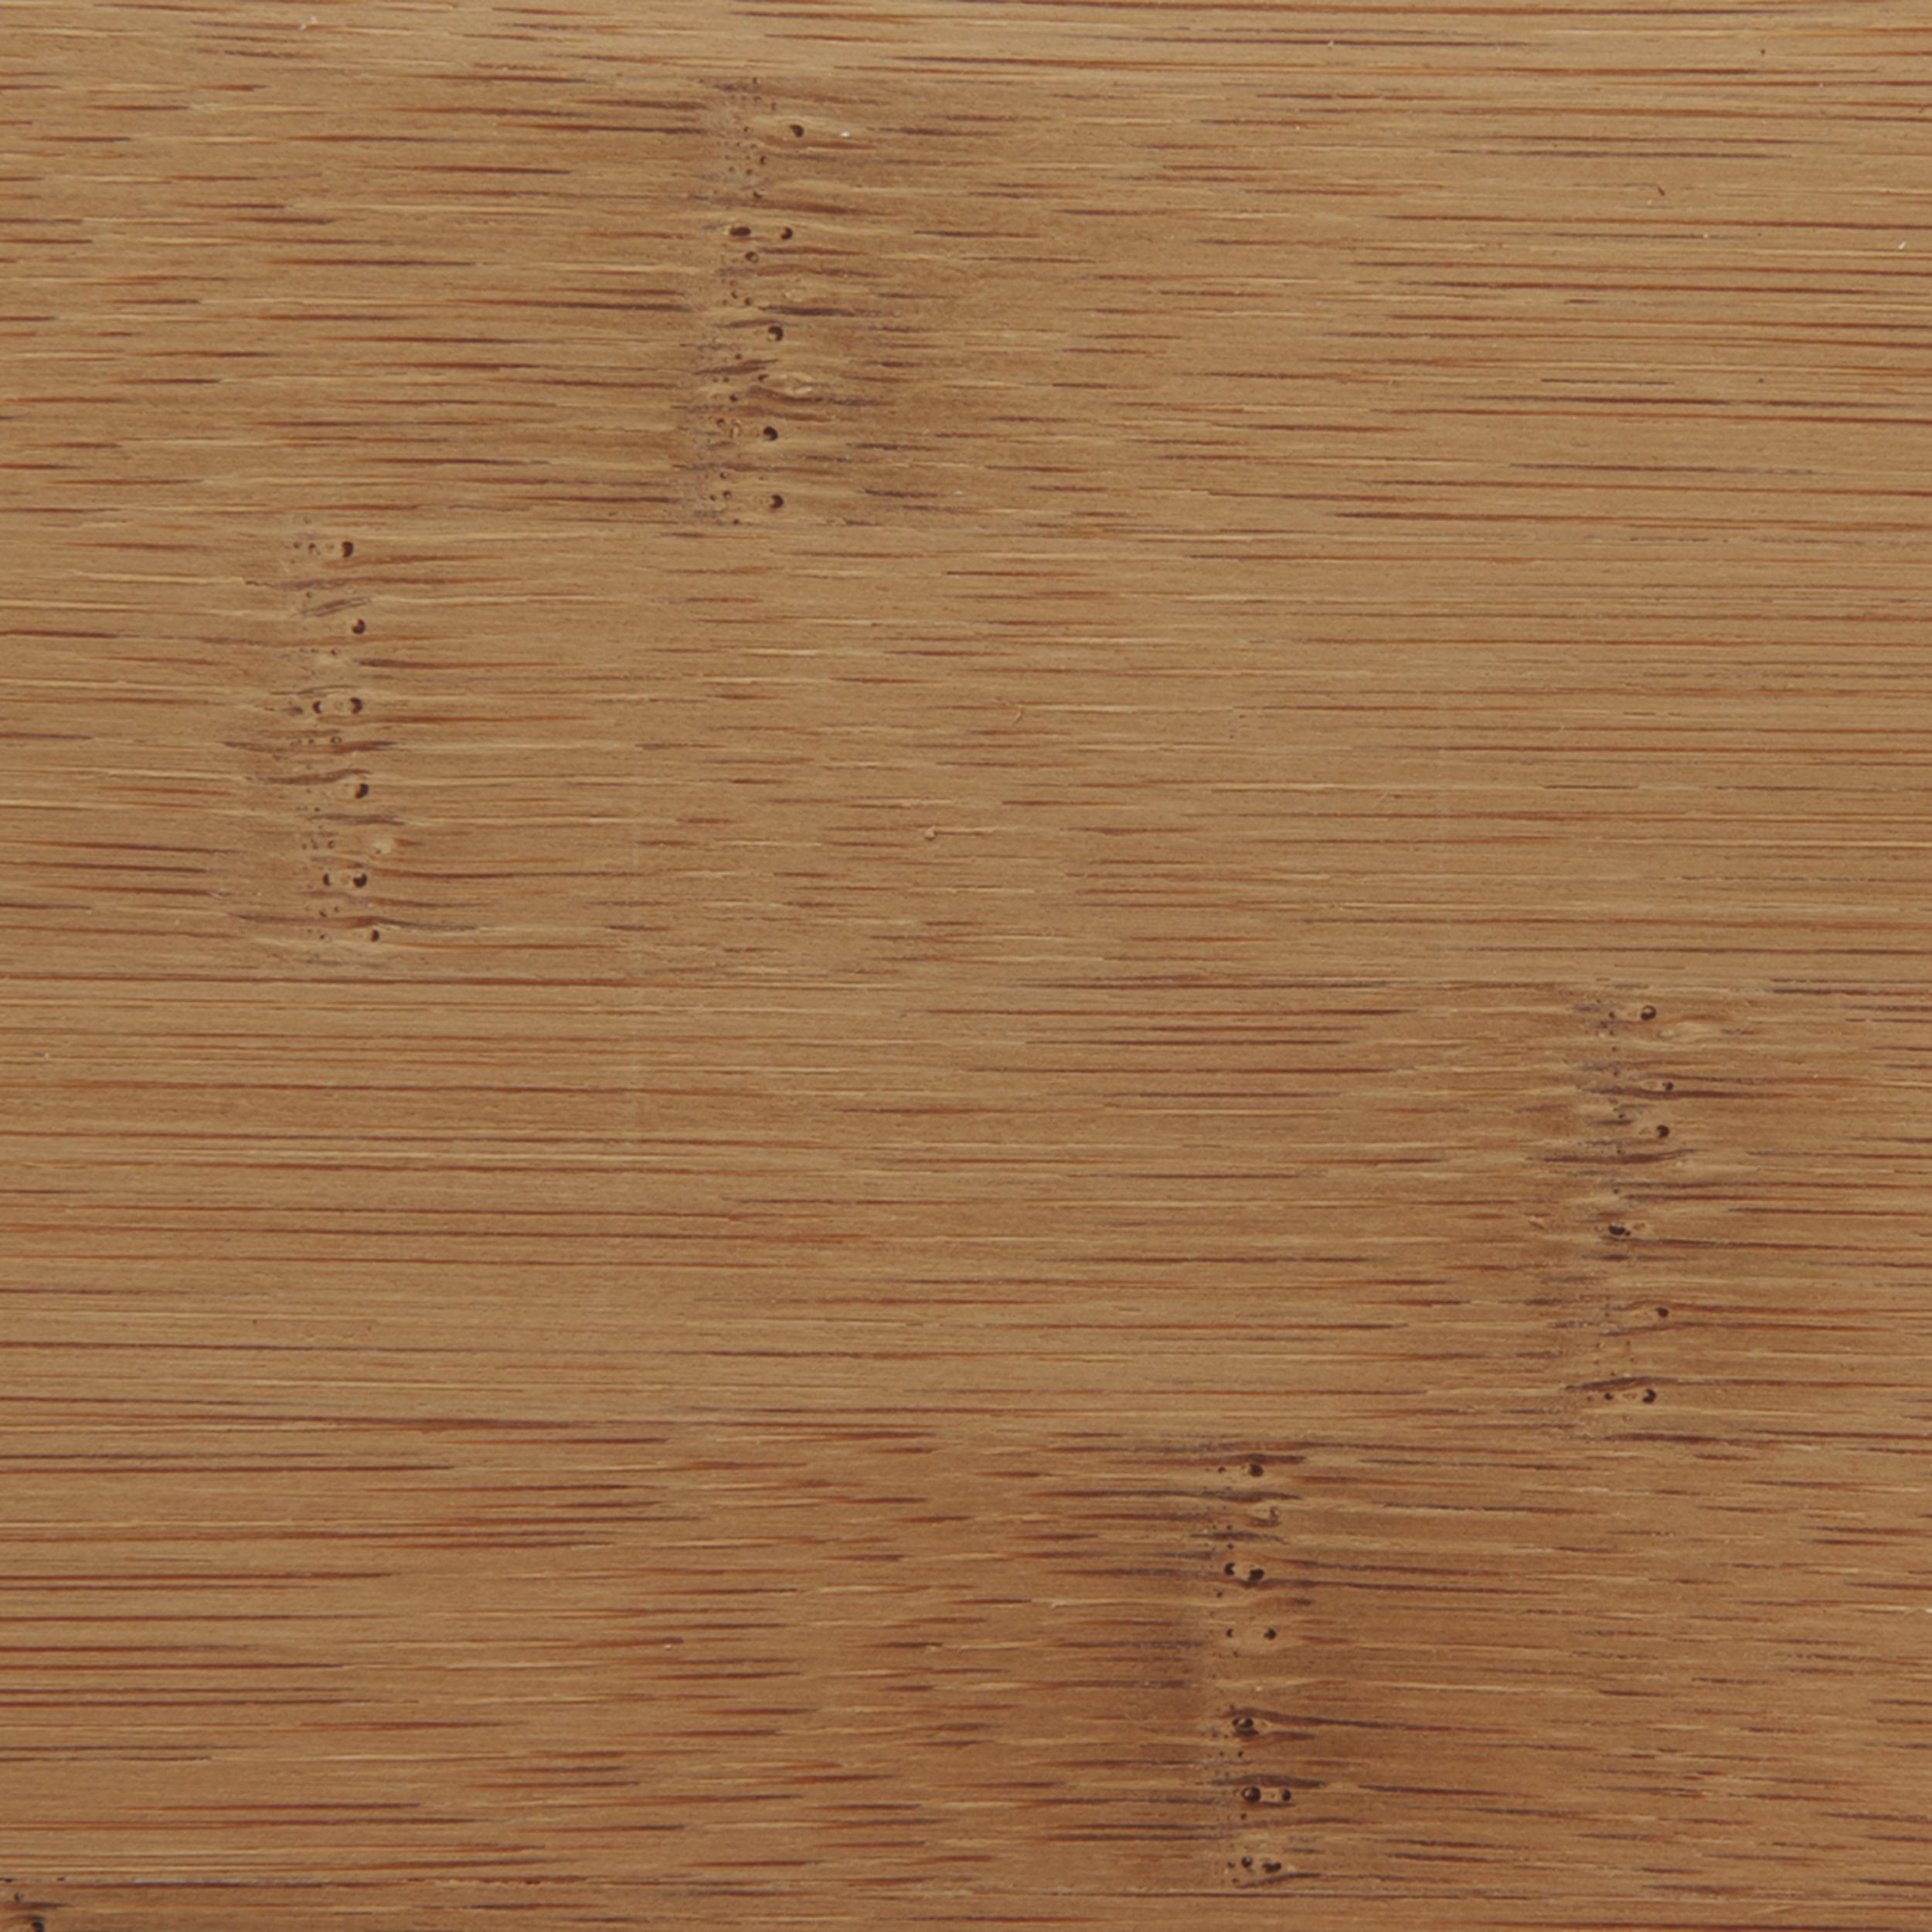 Bamboo, Caramel 4'X8' Veneer Sheet, 10MIL Paper Backed